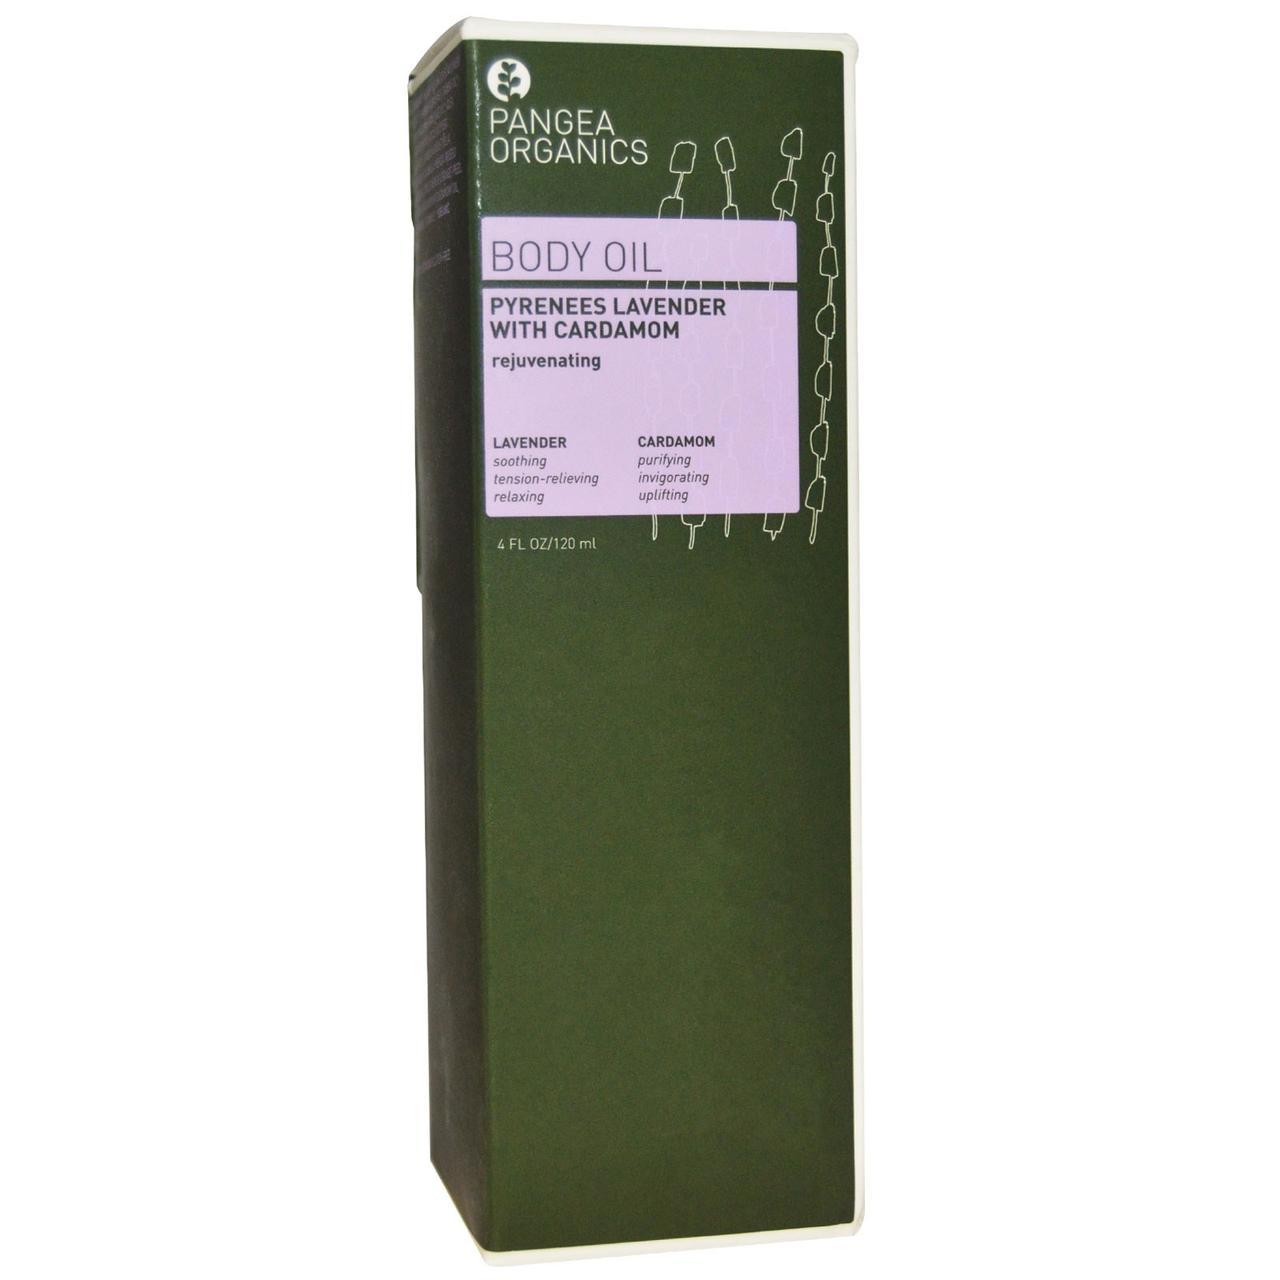 Pangea Organics, Body Oil, Pyrenees Lavender with Cardamom, 4 fl oz (120 ml)